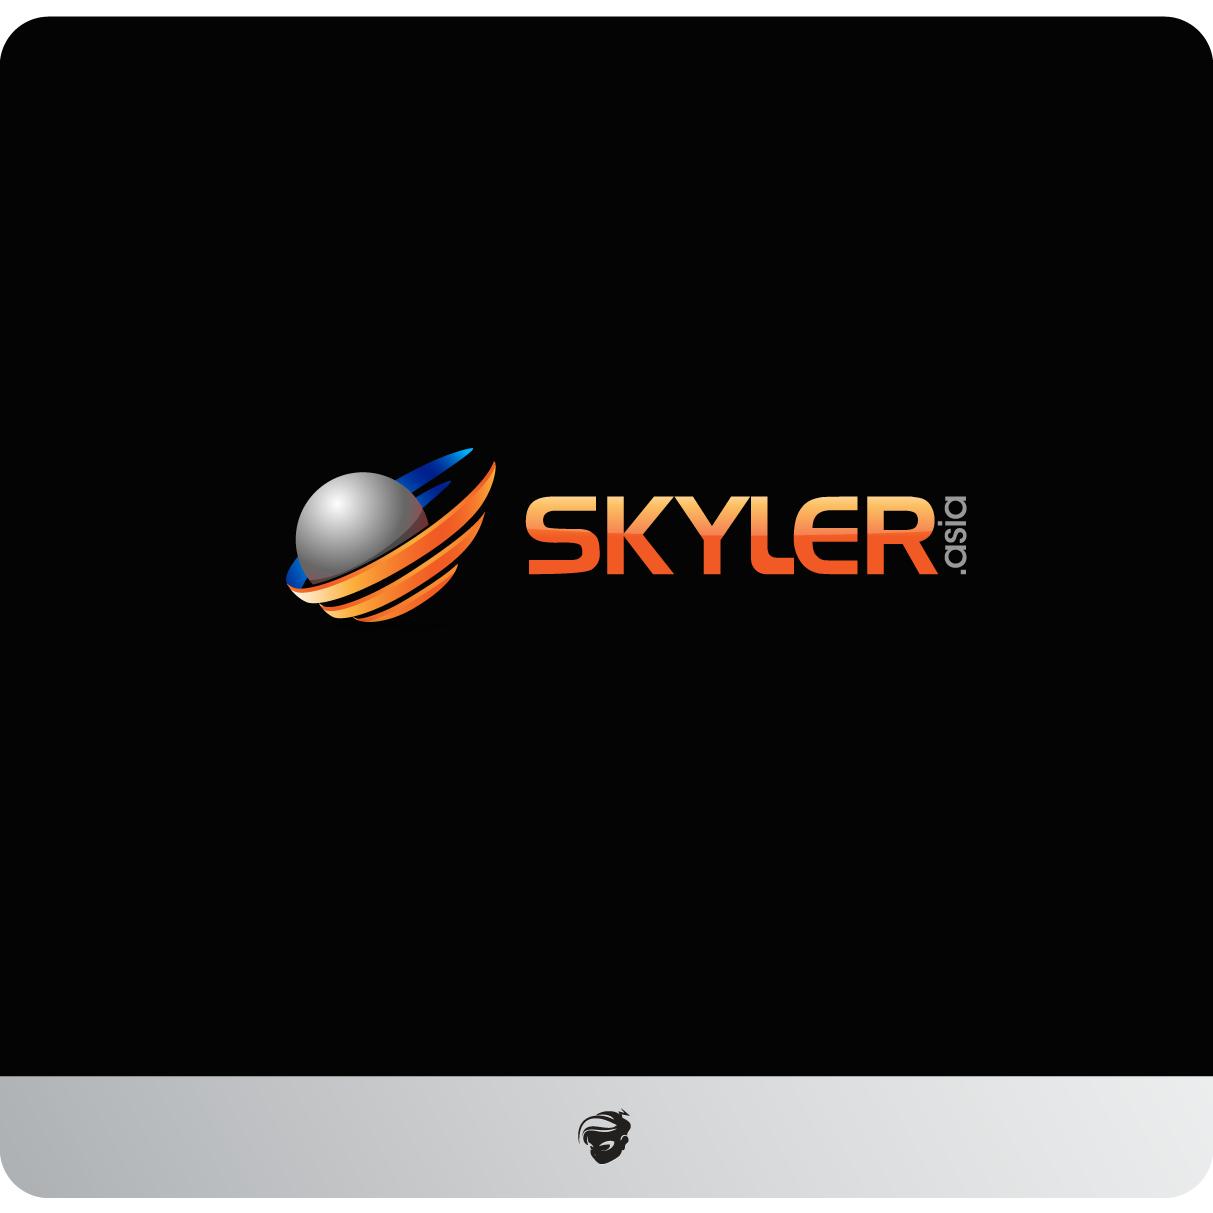 Logo Design by zesthar - Entry No. 114 in the Logo Design Contest Artistic Logo Design for Skyler.Asia.